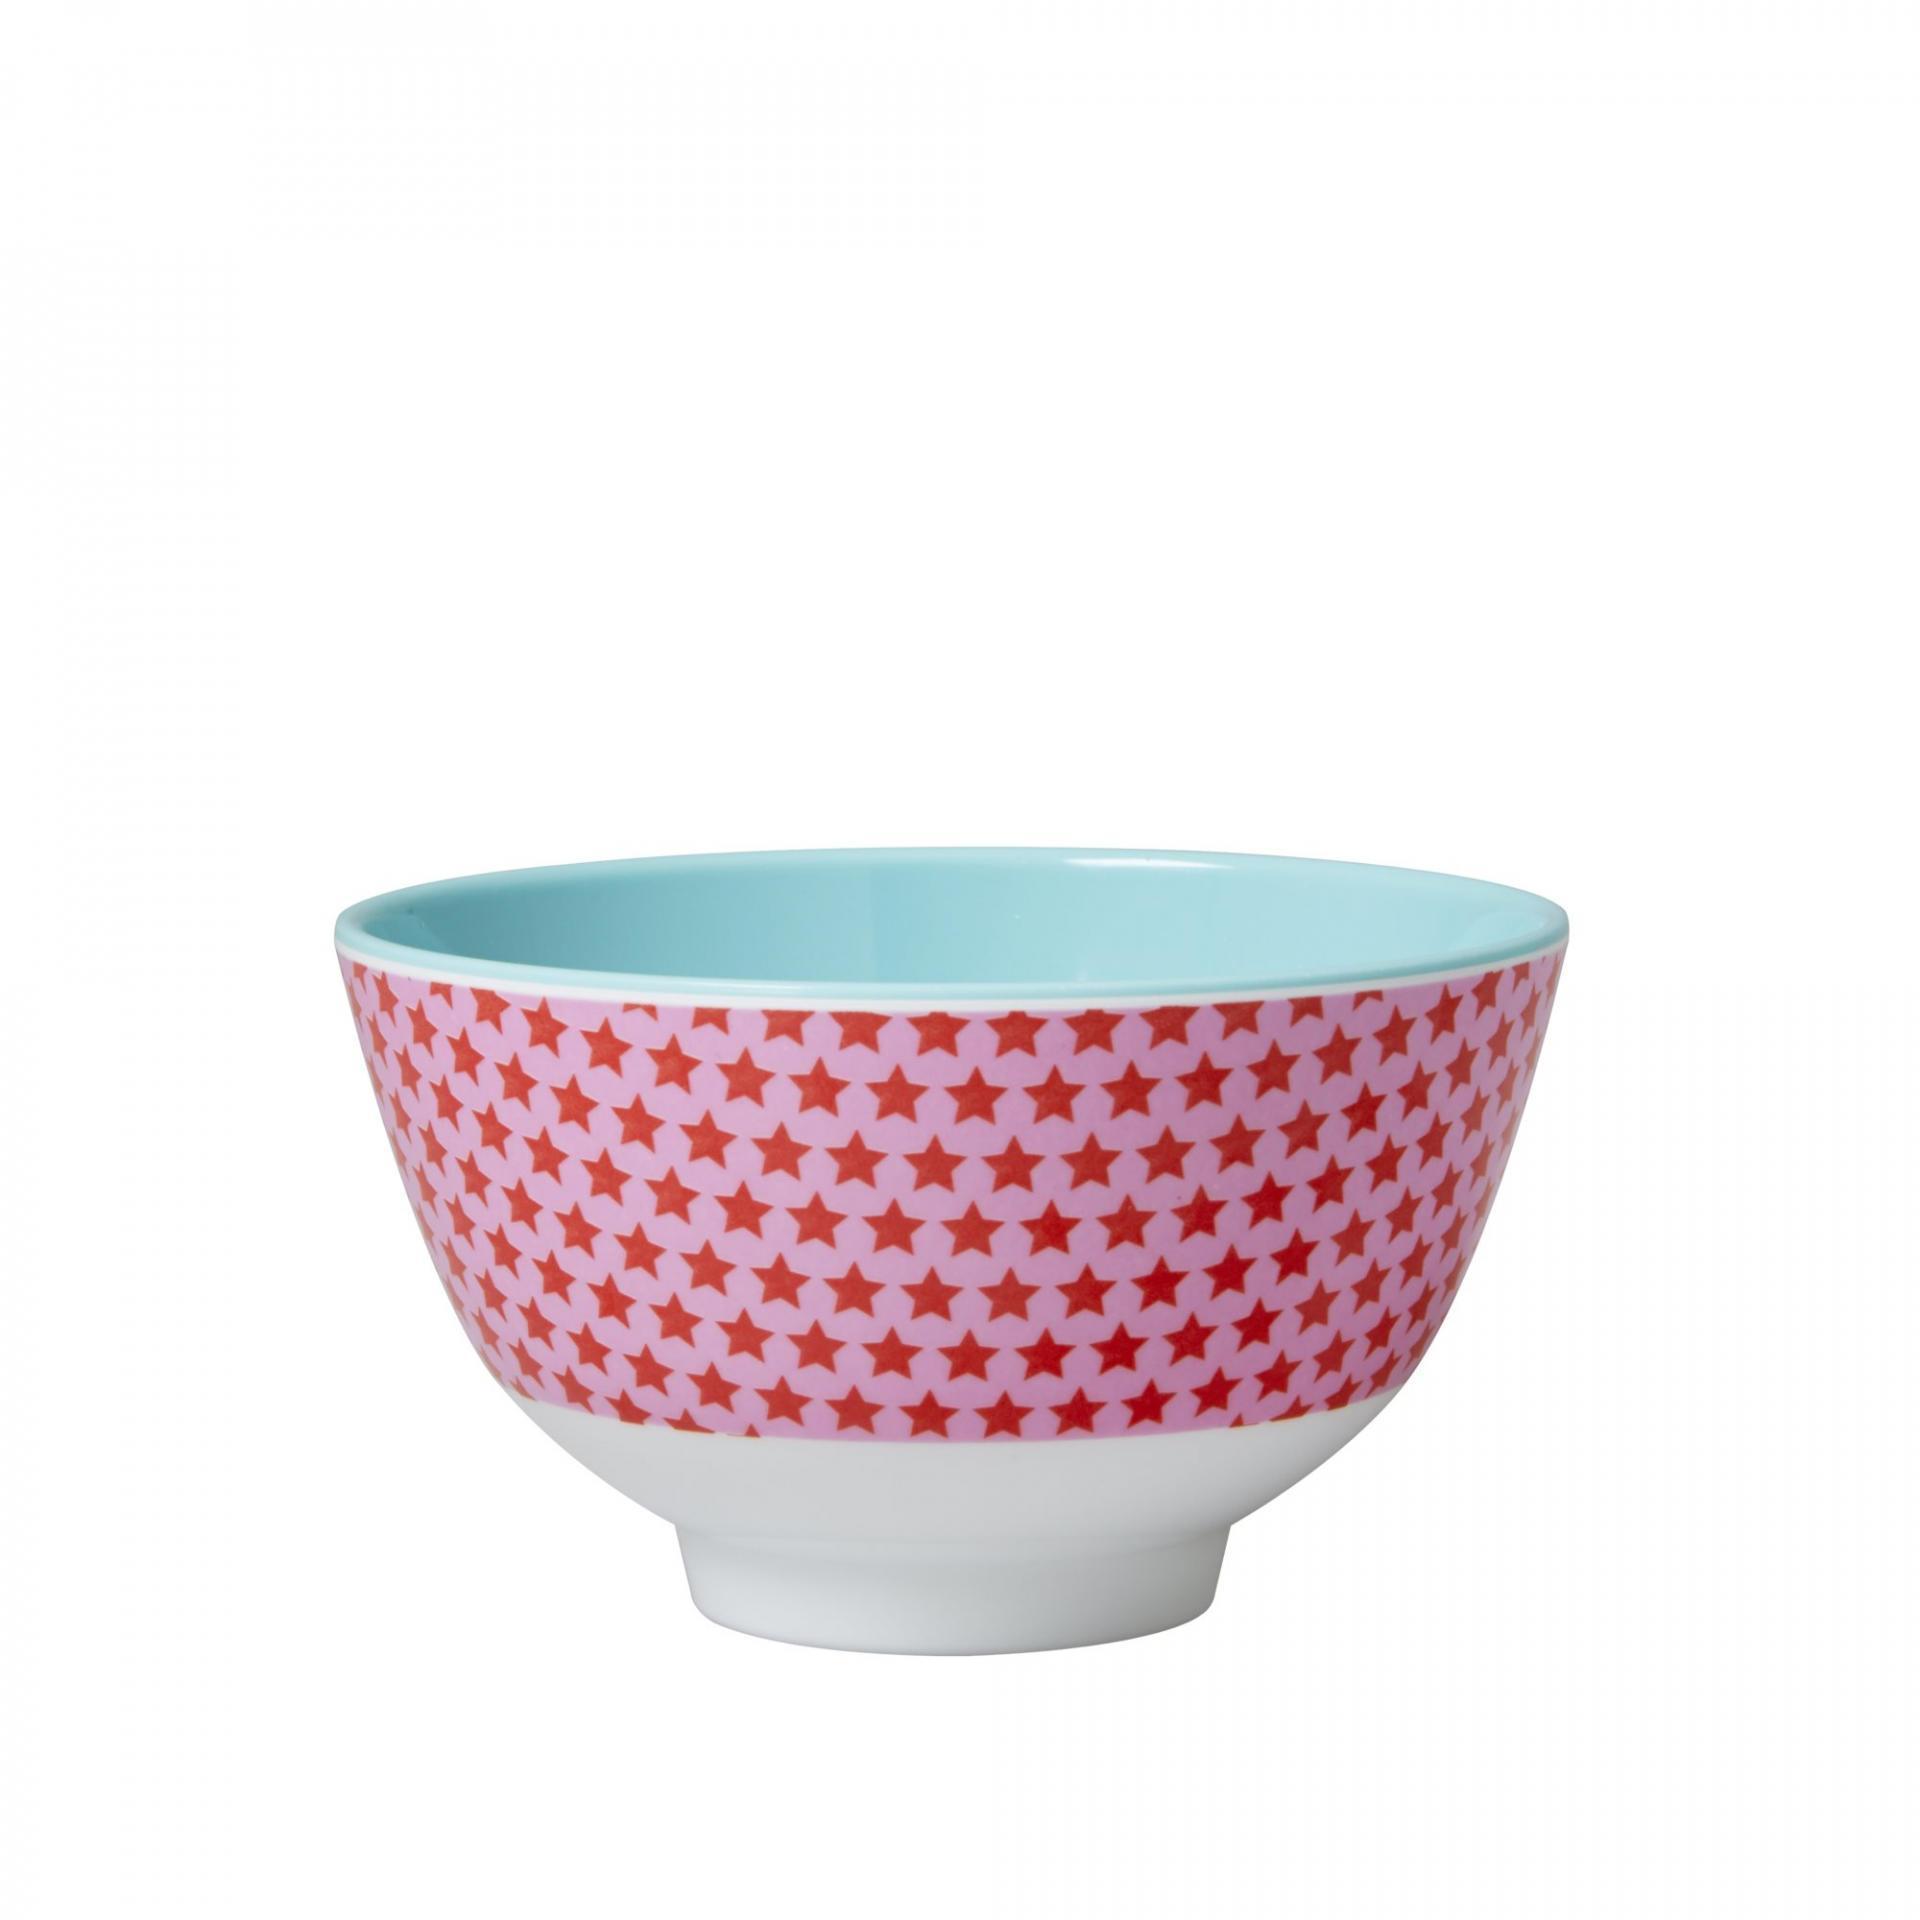 rice Melaminová miska Girls star small, růžová barva, modrá barva